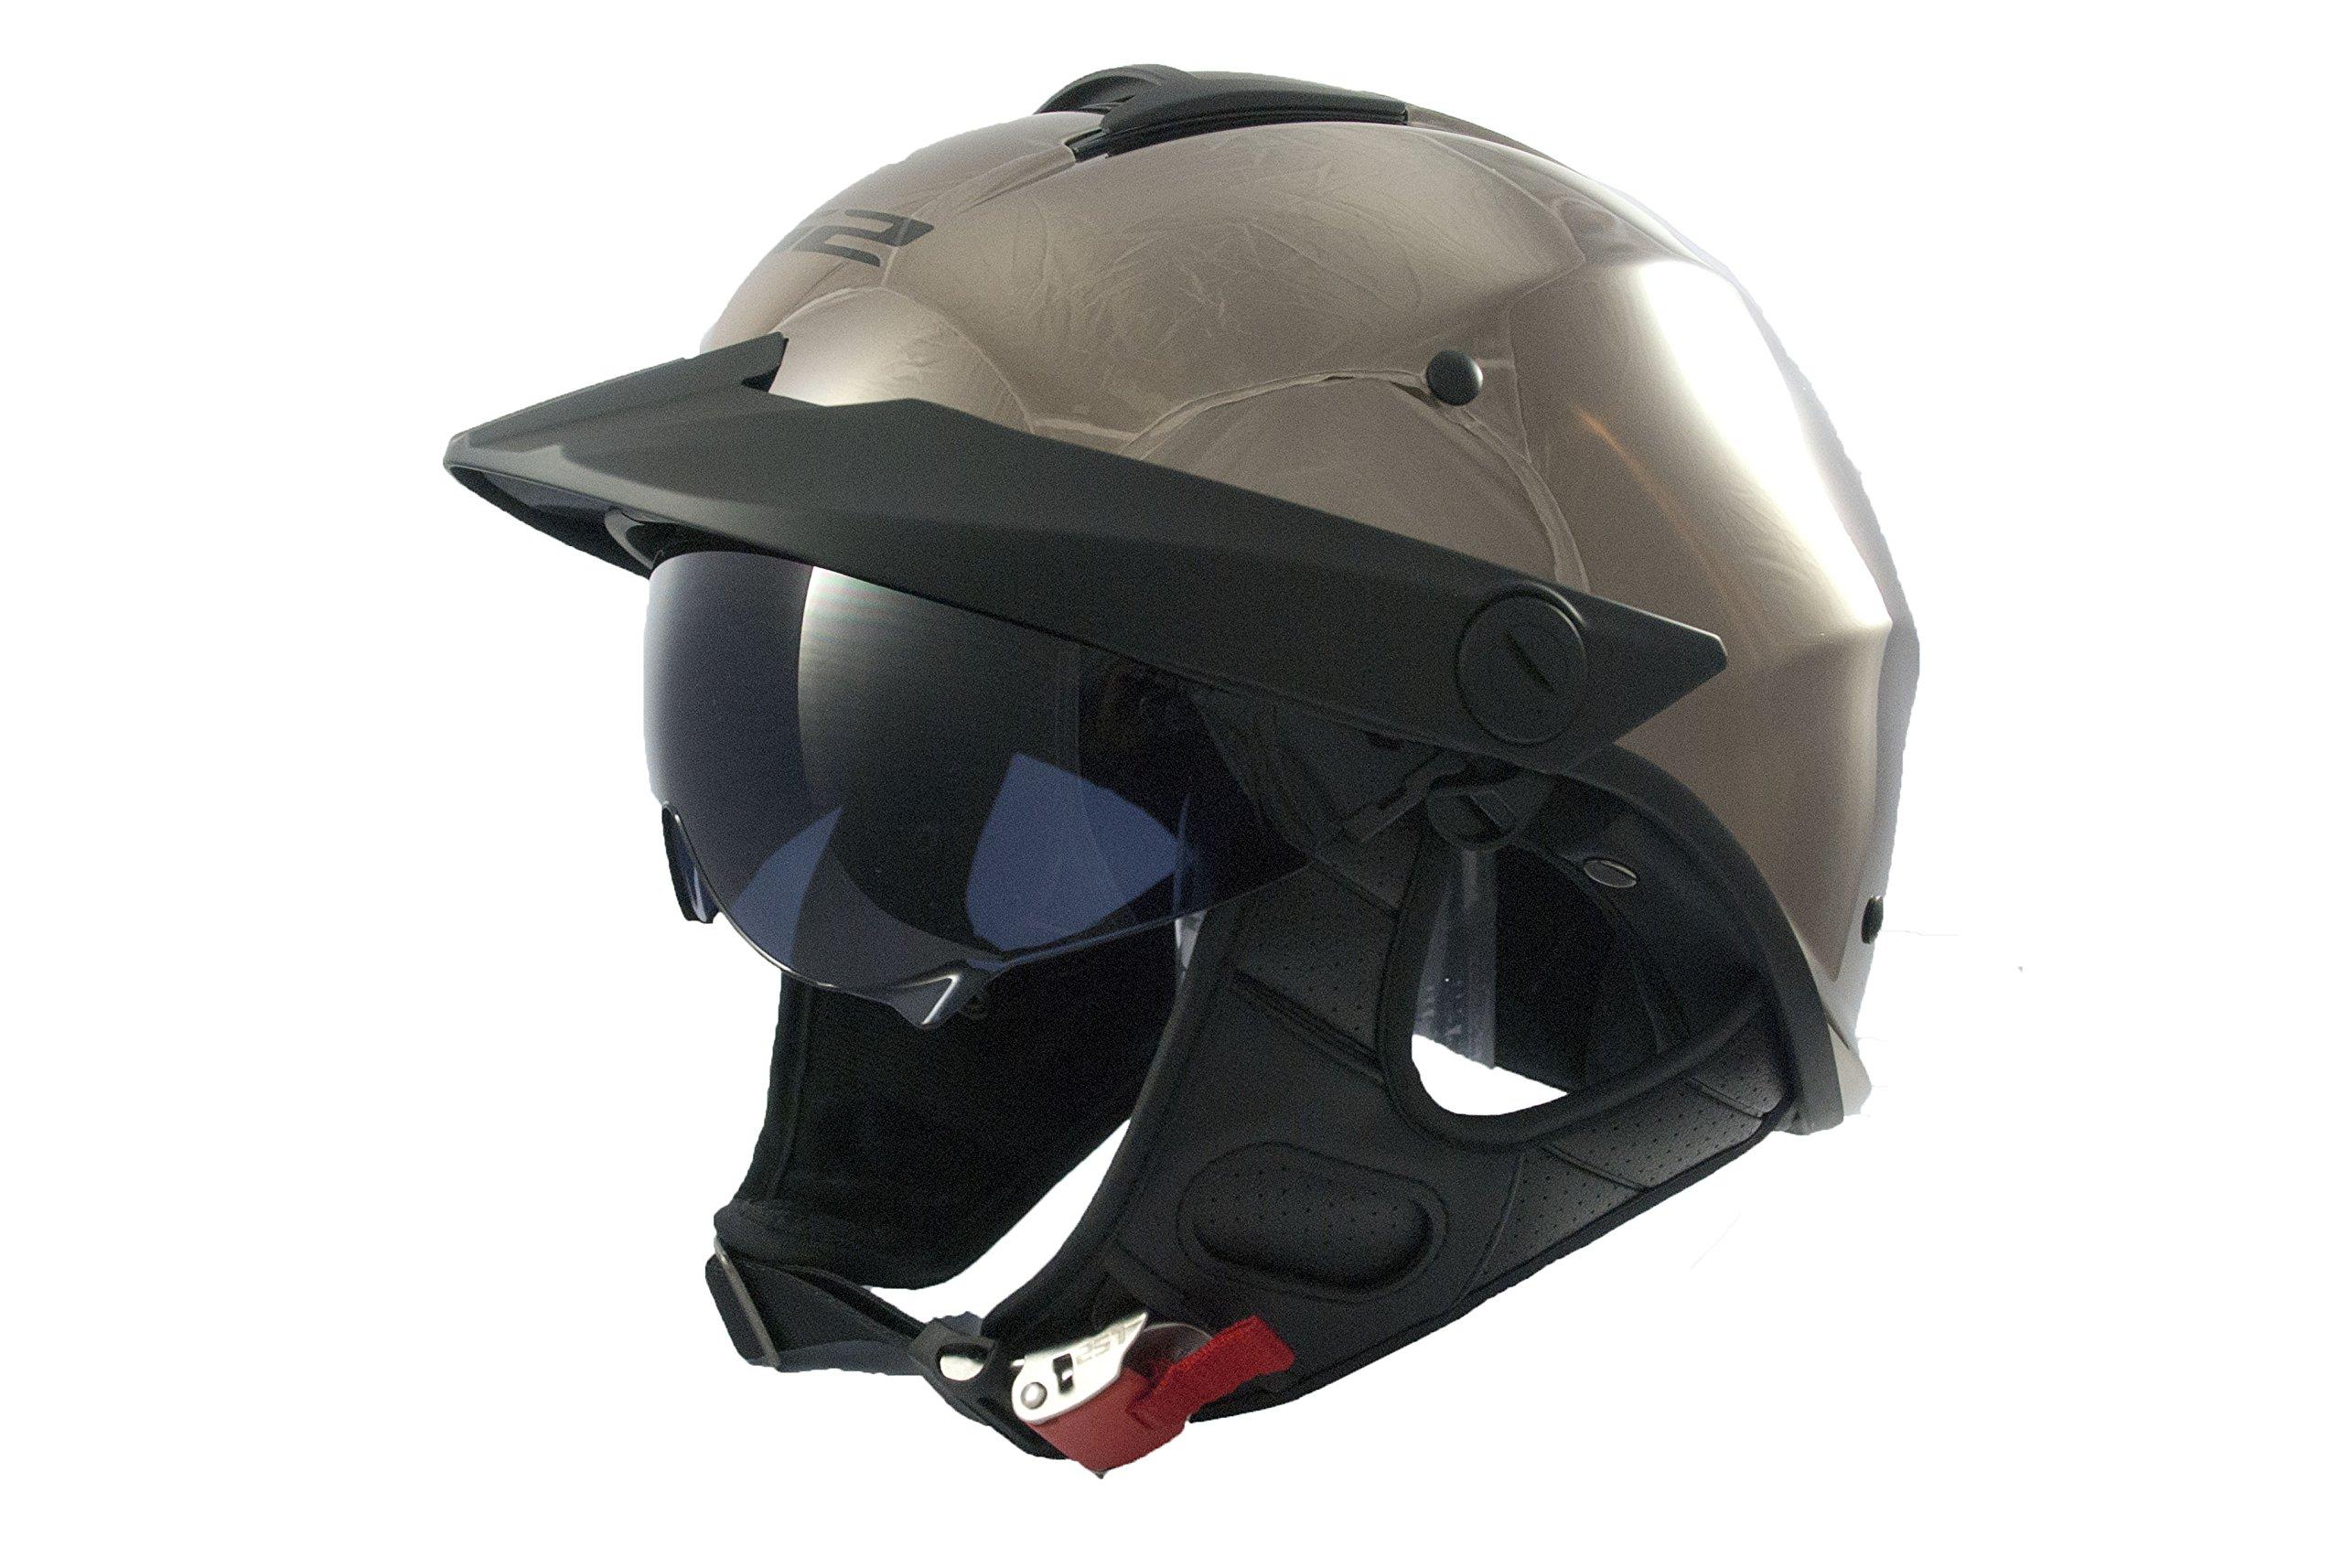 LS2 Helmets Rebellion Solid Unisex-Adult Half-Size-Helmet-Style Helmet with Sun Shield (Black Chrome, Large)